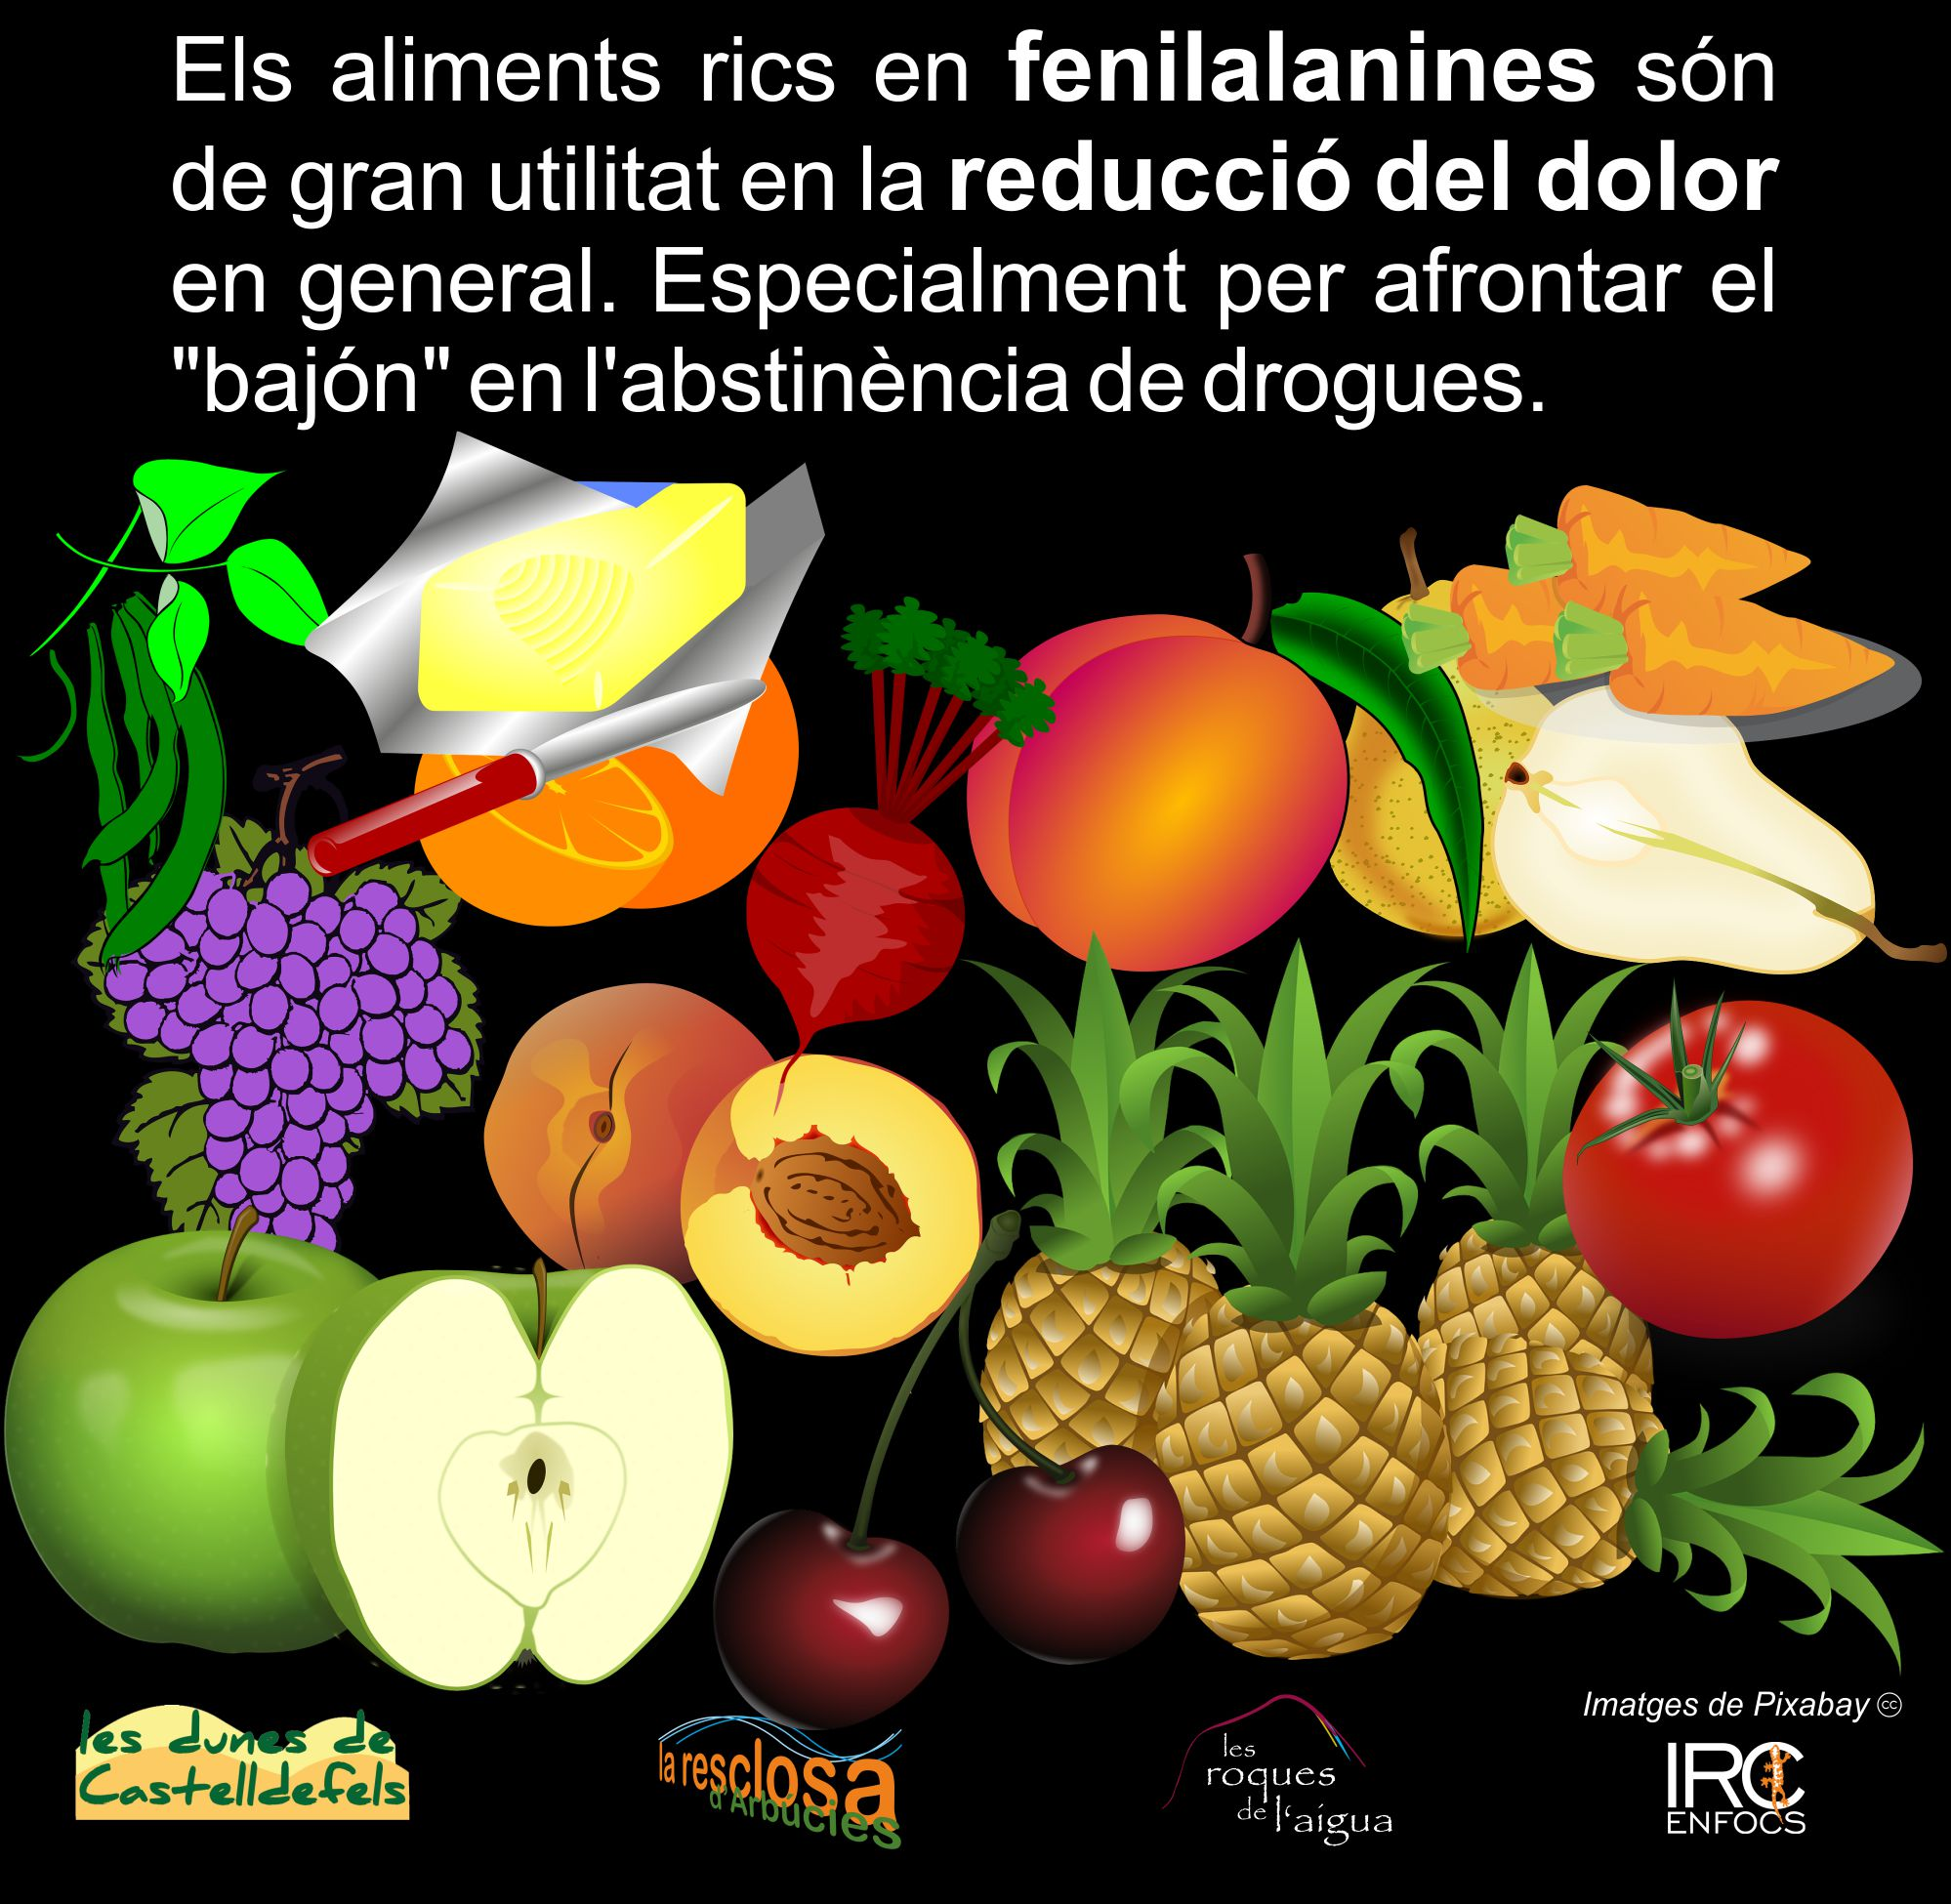 aliments fenilalanines